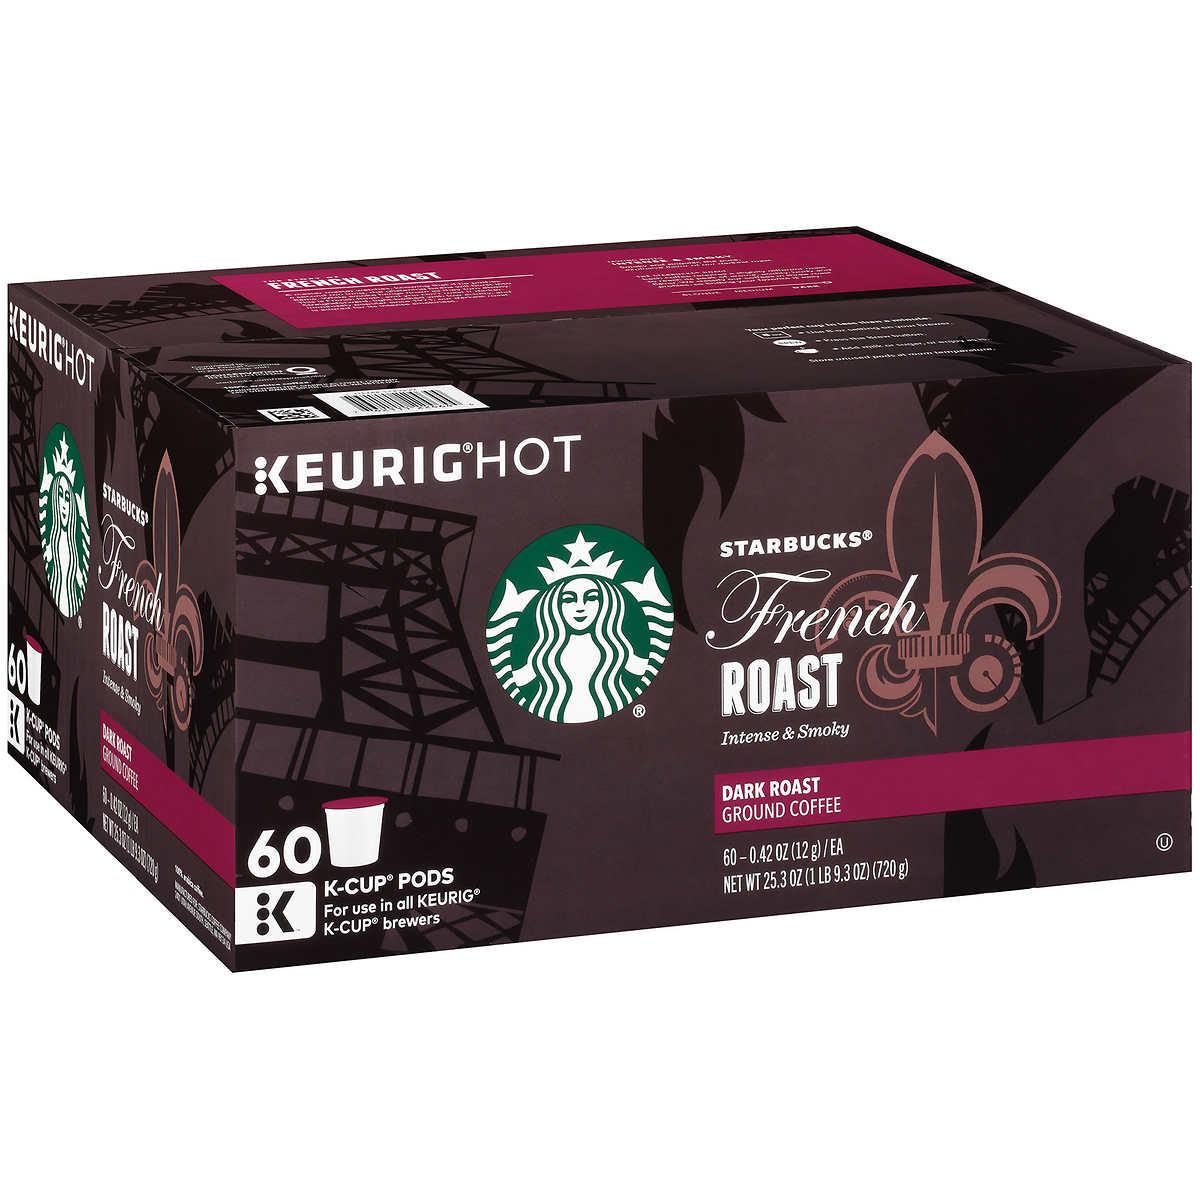 7ed6c8f3f54 ... Starbucks French Roast Coffee, Dark, 60 K-Cup Pods. 1 1